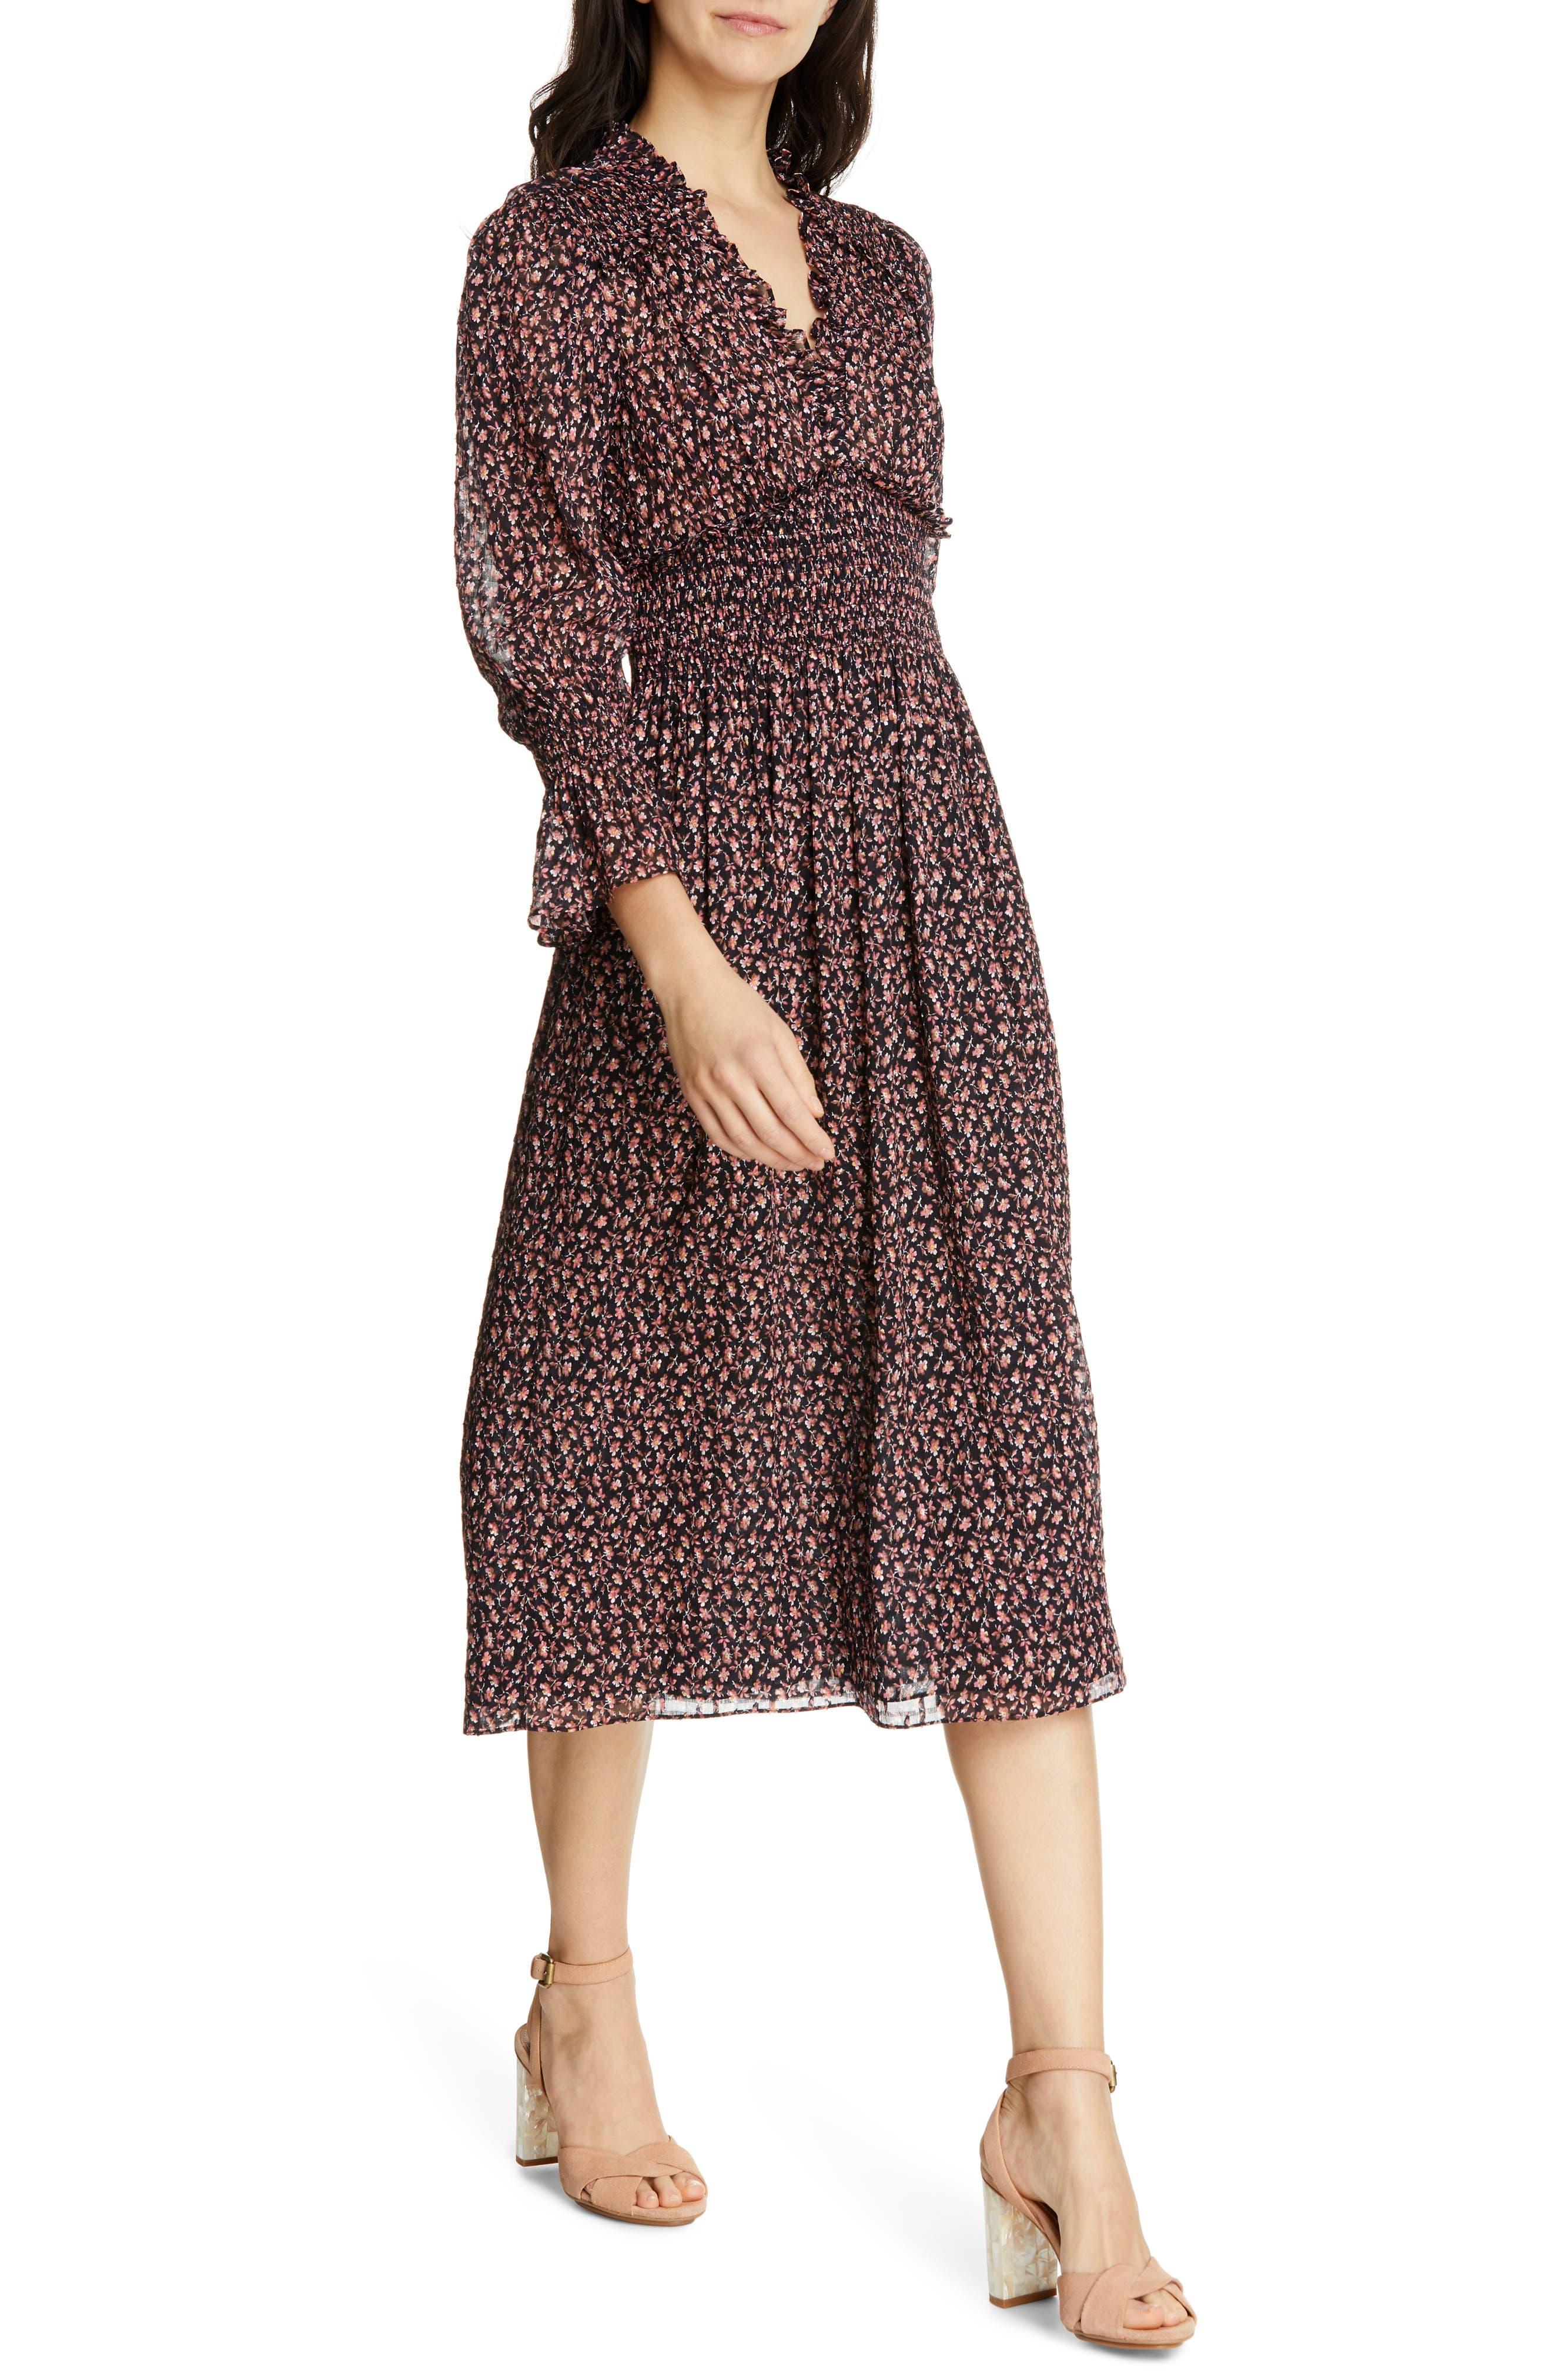 REBECCA TAYLOR, Floral Smock Detail Long Sleeve Silk & Cotton Dress, Alternate thumbnail 4, color, NAVY COMBO